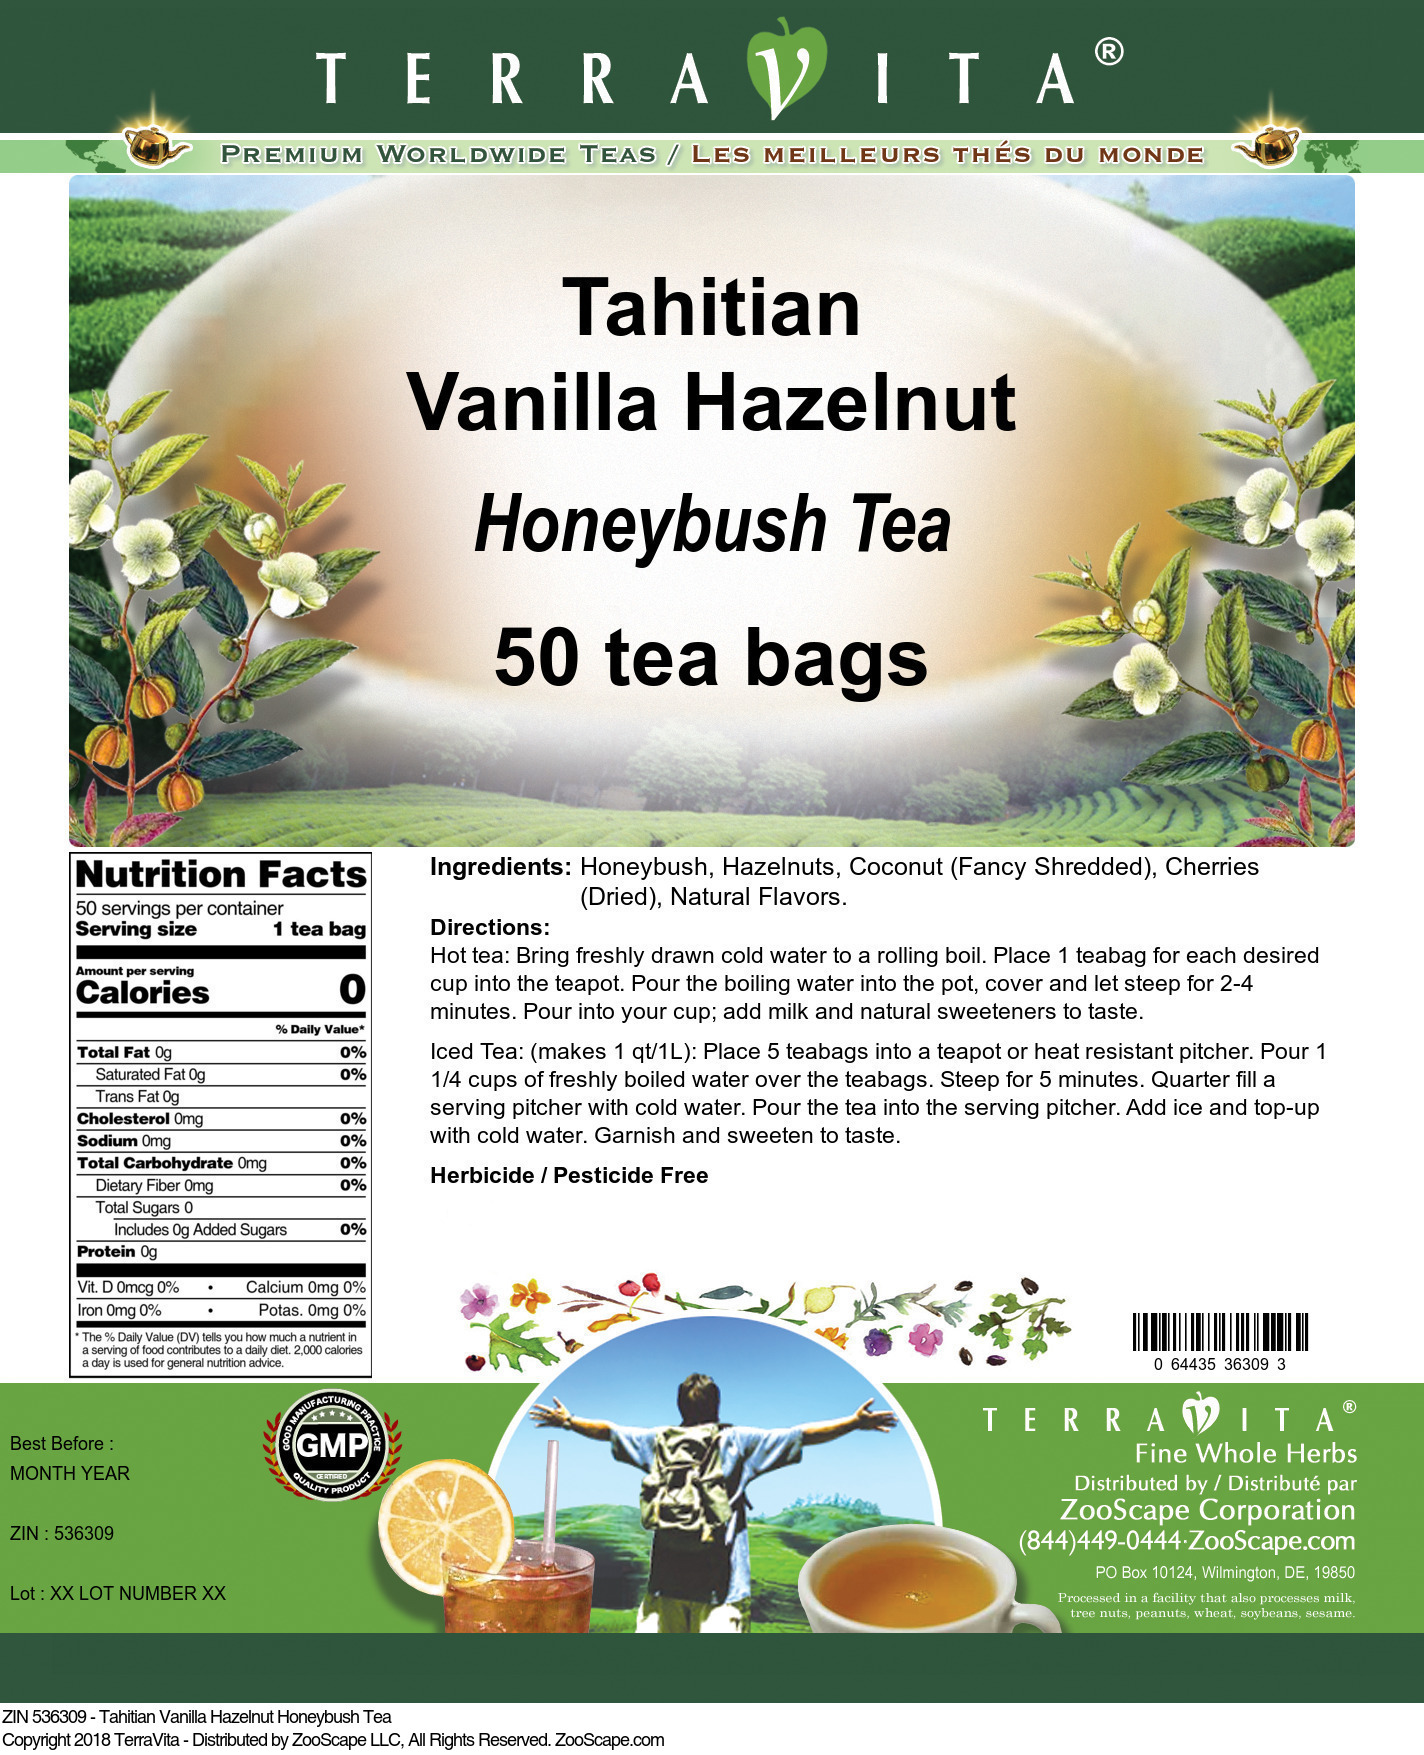 Tahitian Vanilla Hazelnut Honeybush Tea